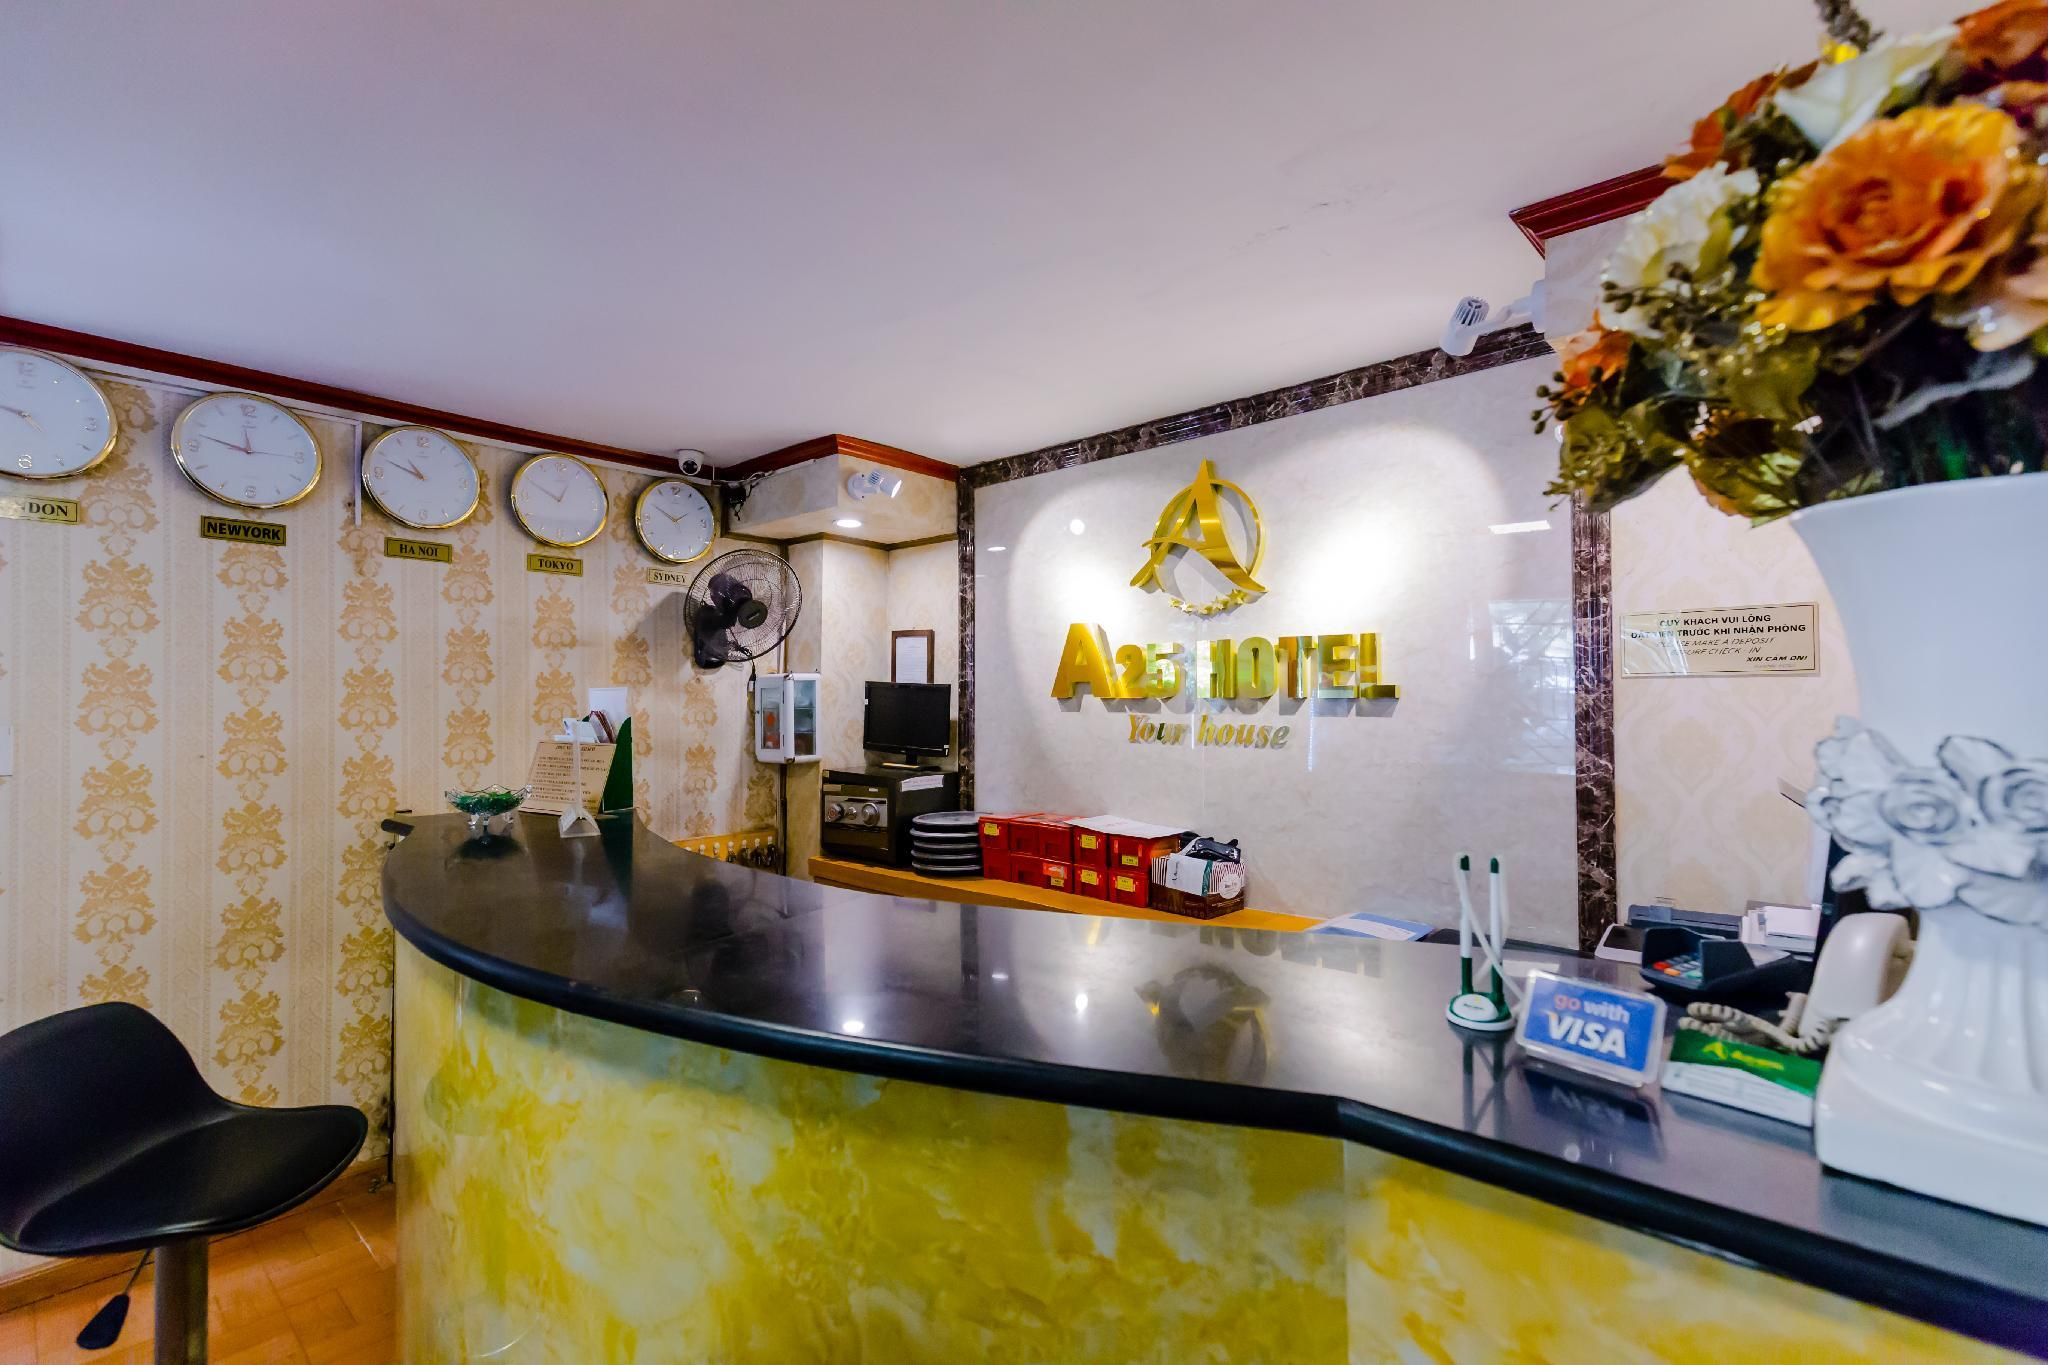 A25 Hotel   Hoang Quoc Viet